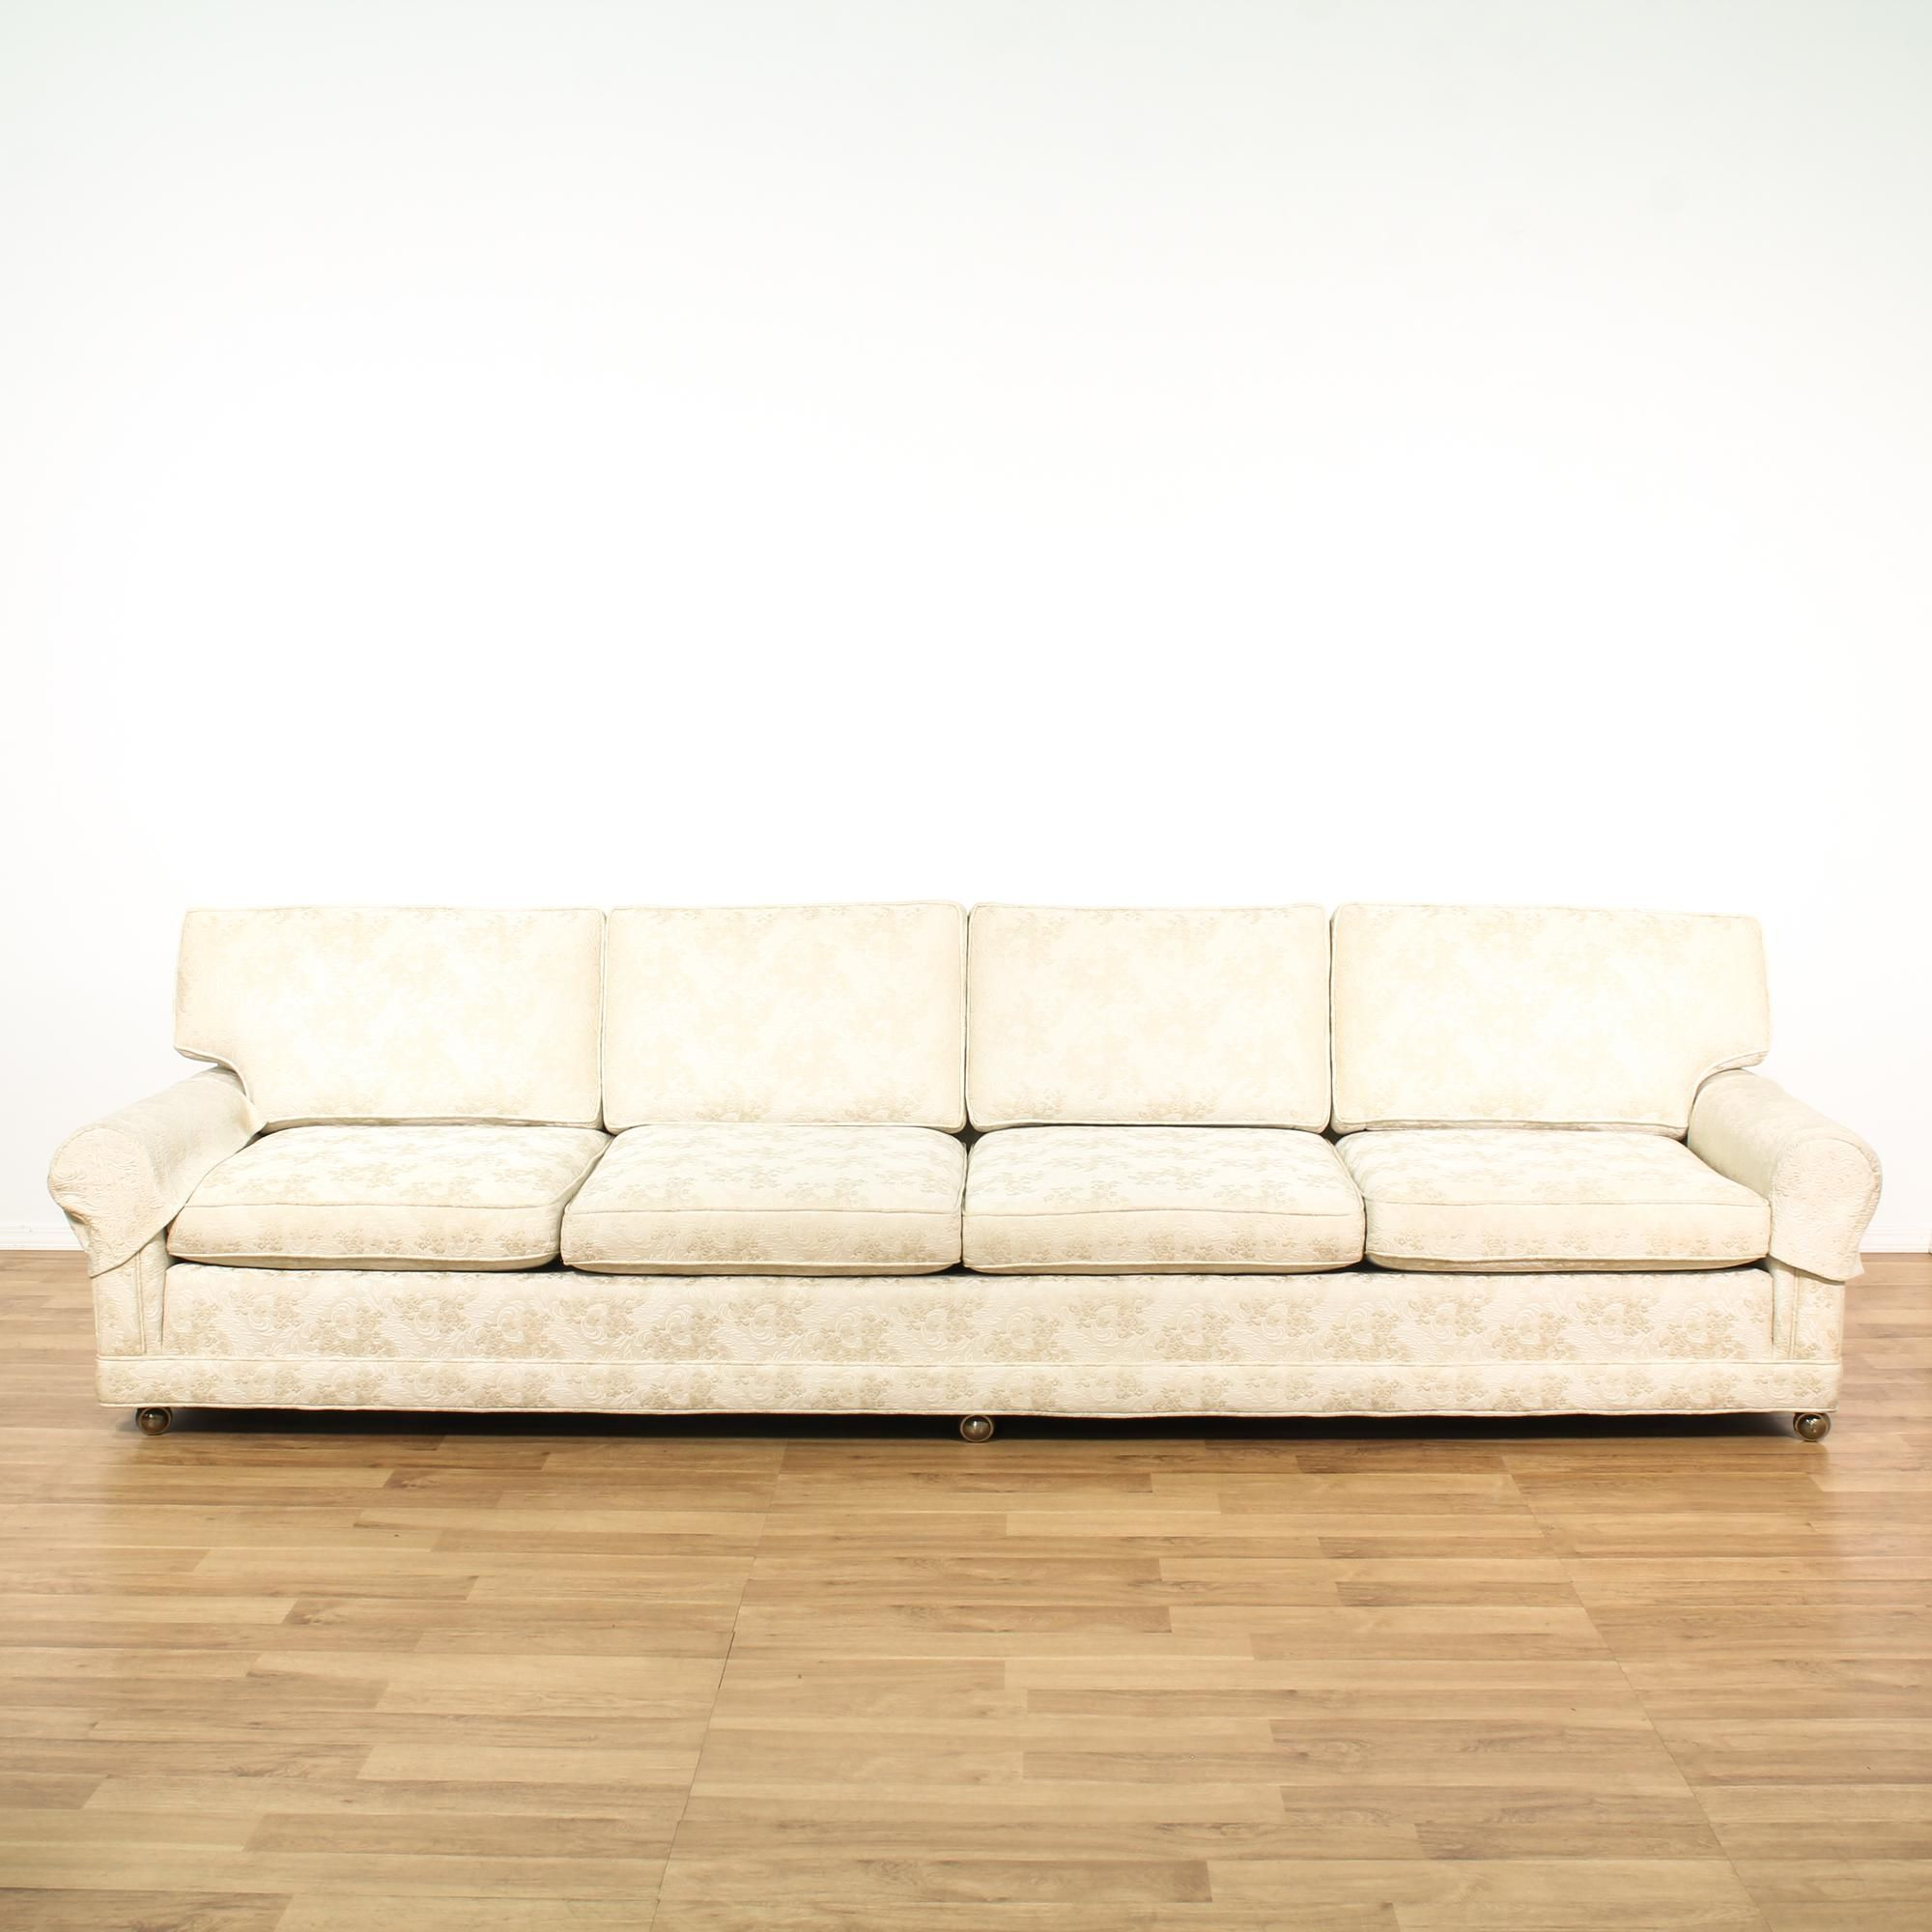 Krause Sleeper Sofa Funky Clearance White Brocade Baci Living Room